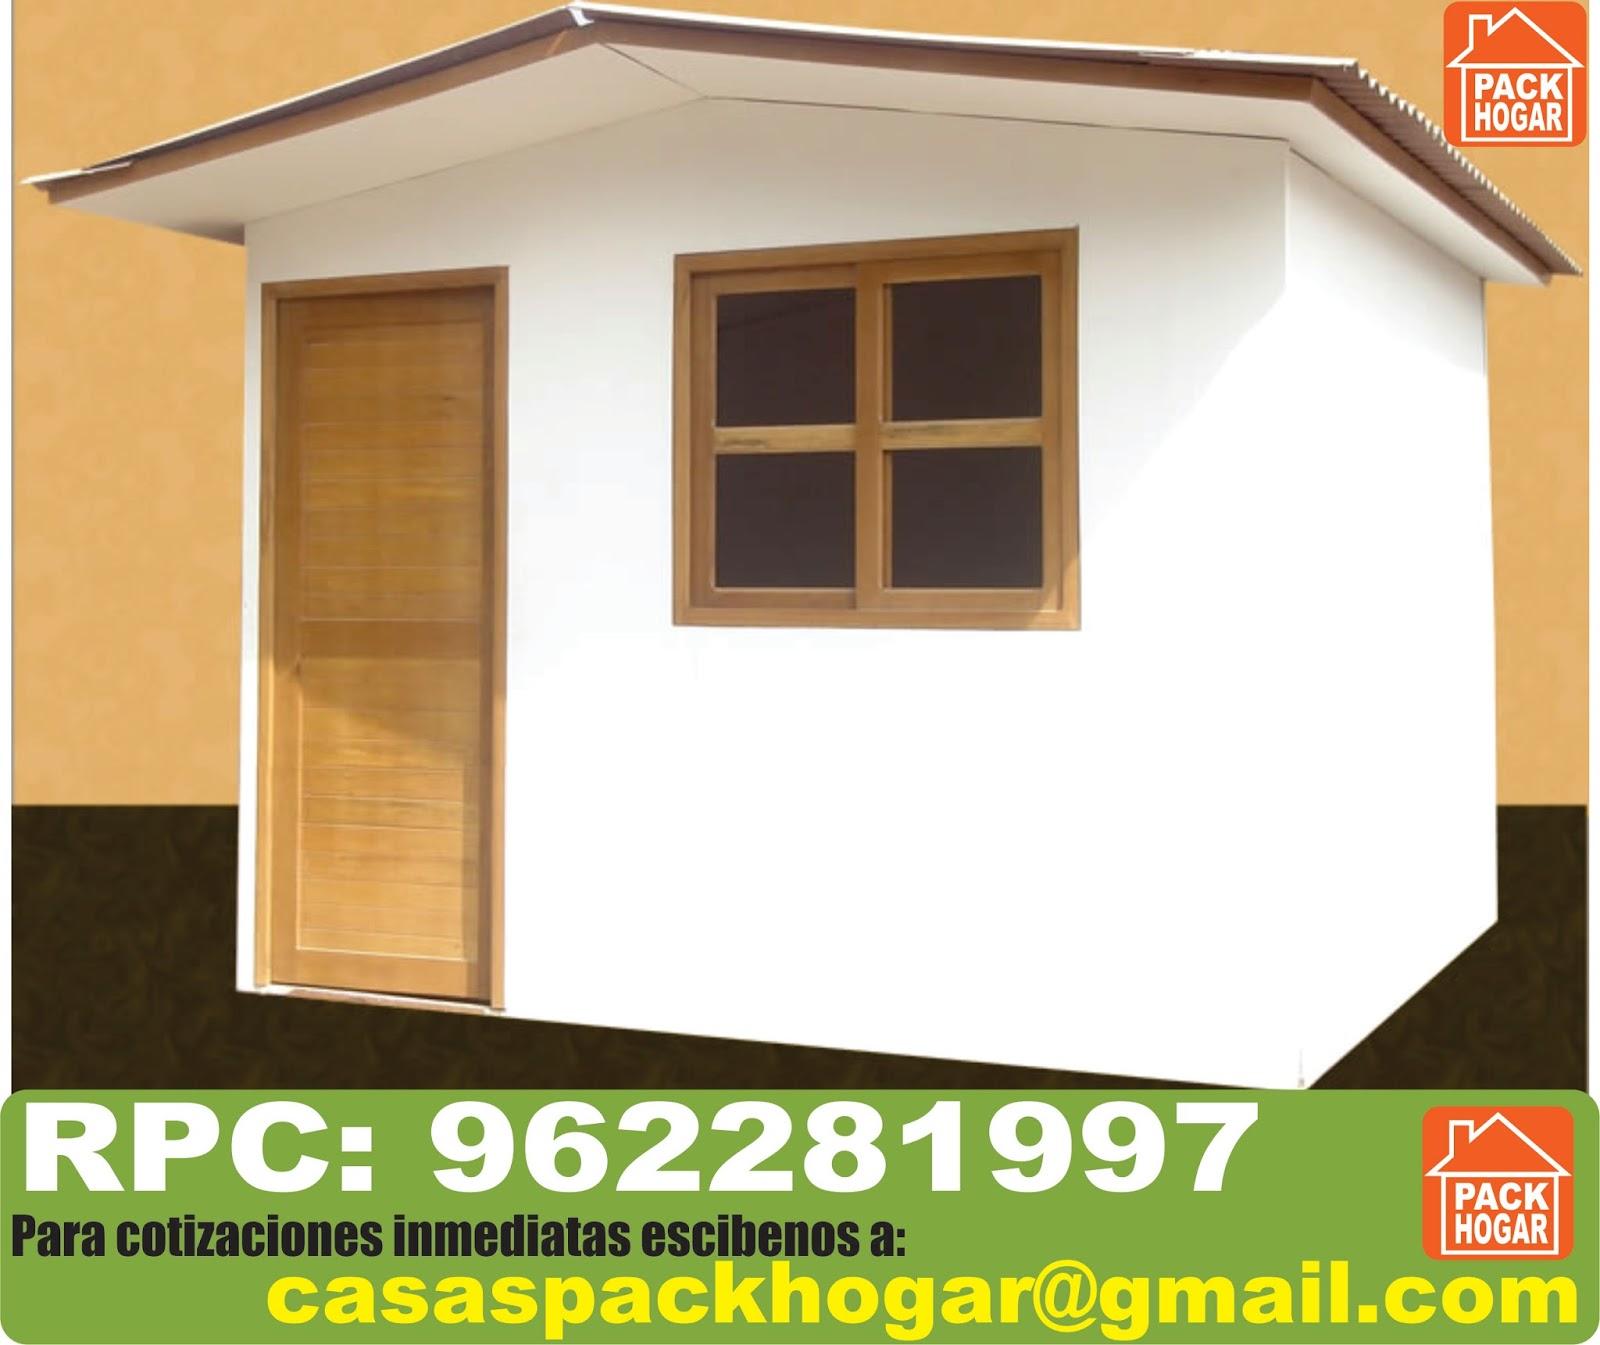 Casetas prefabricadas de madera para terrazas packhogar - Feria de casas prefabricadas ...